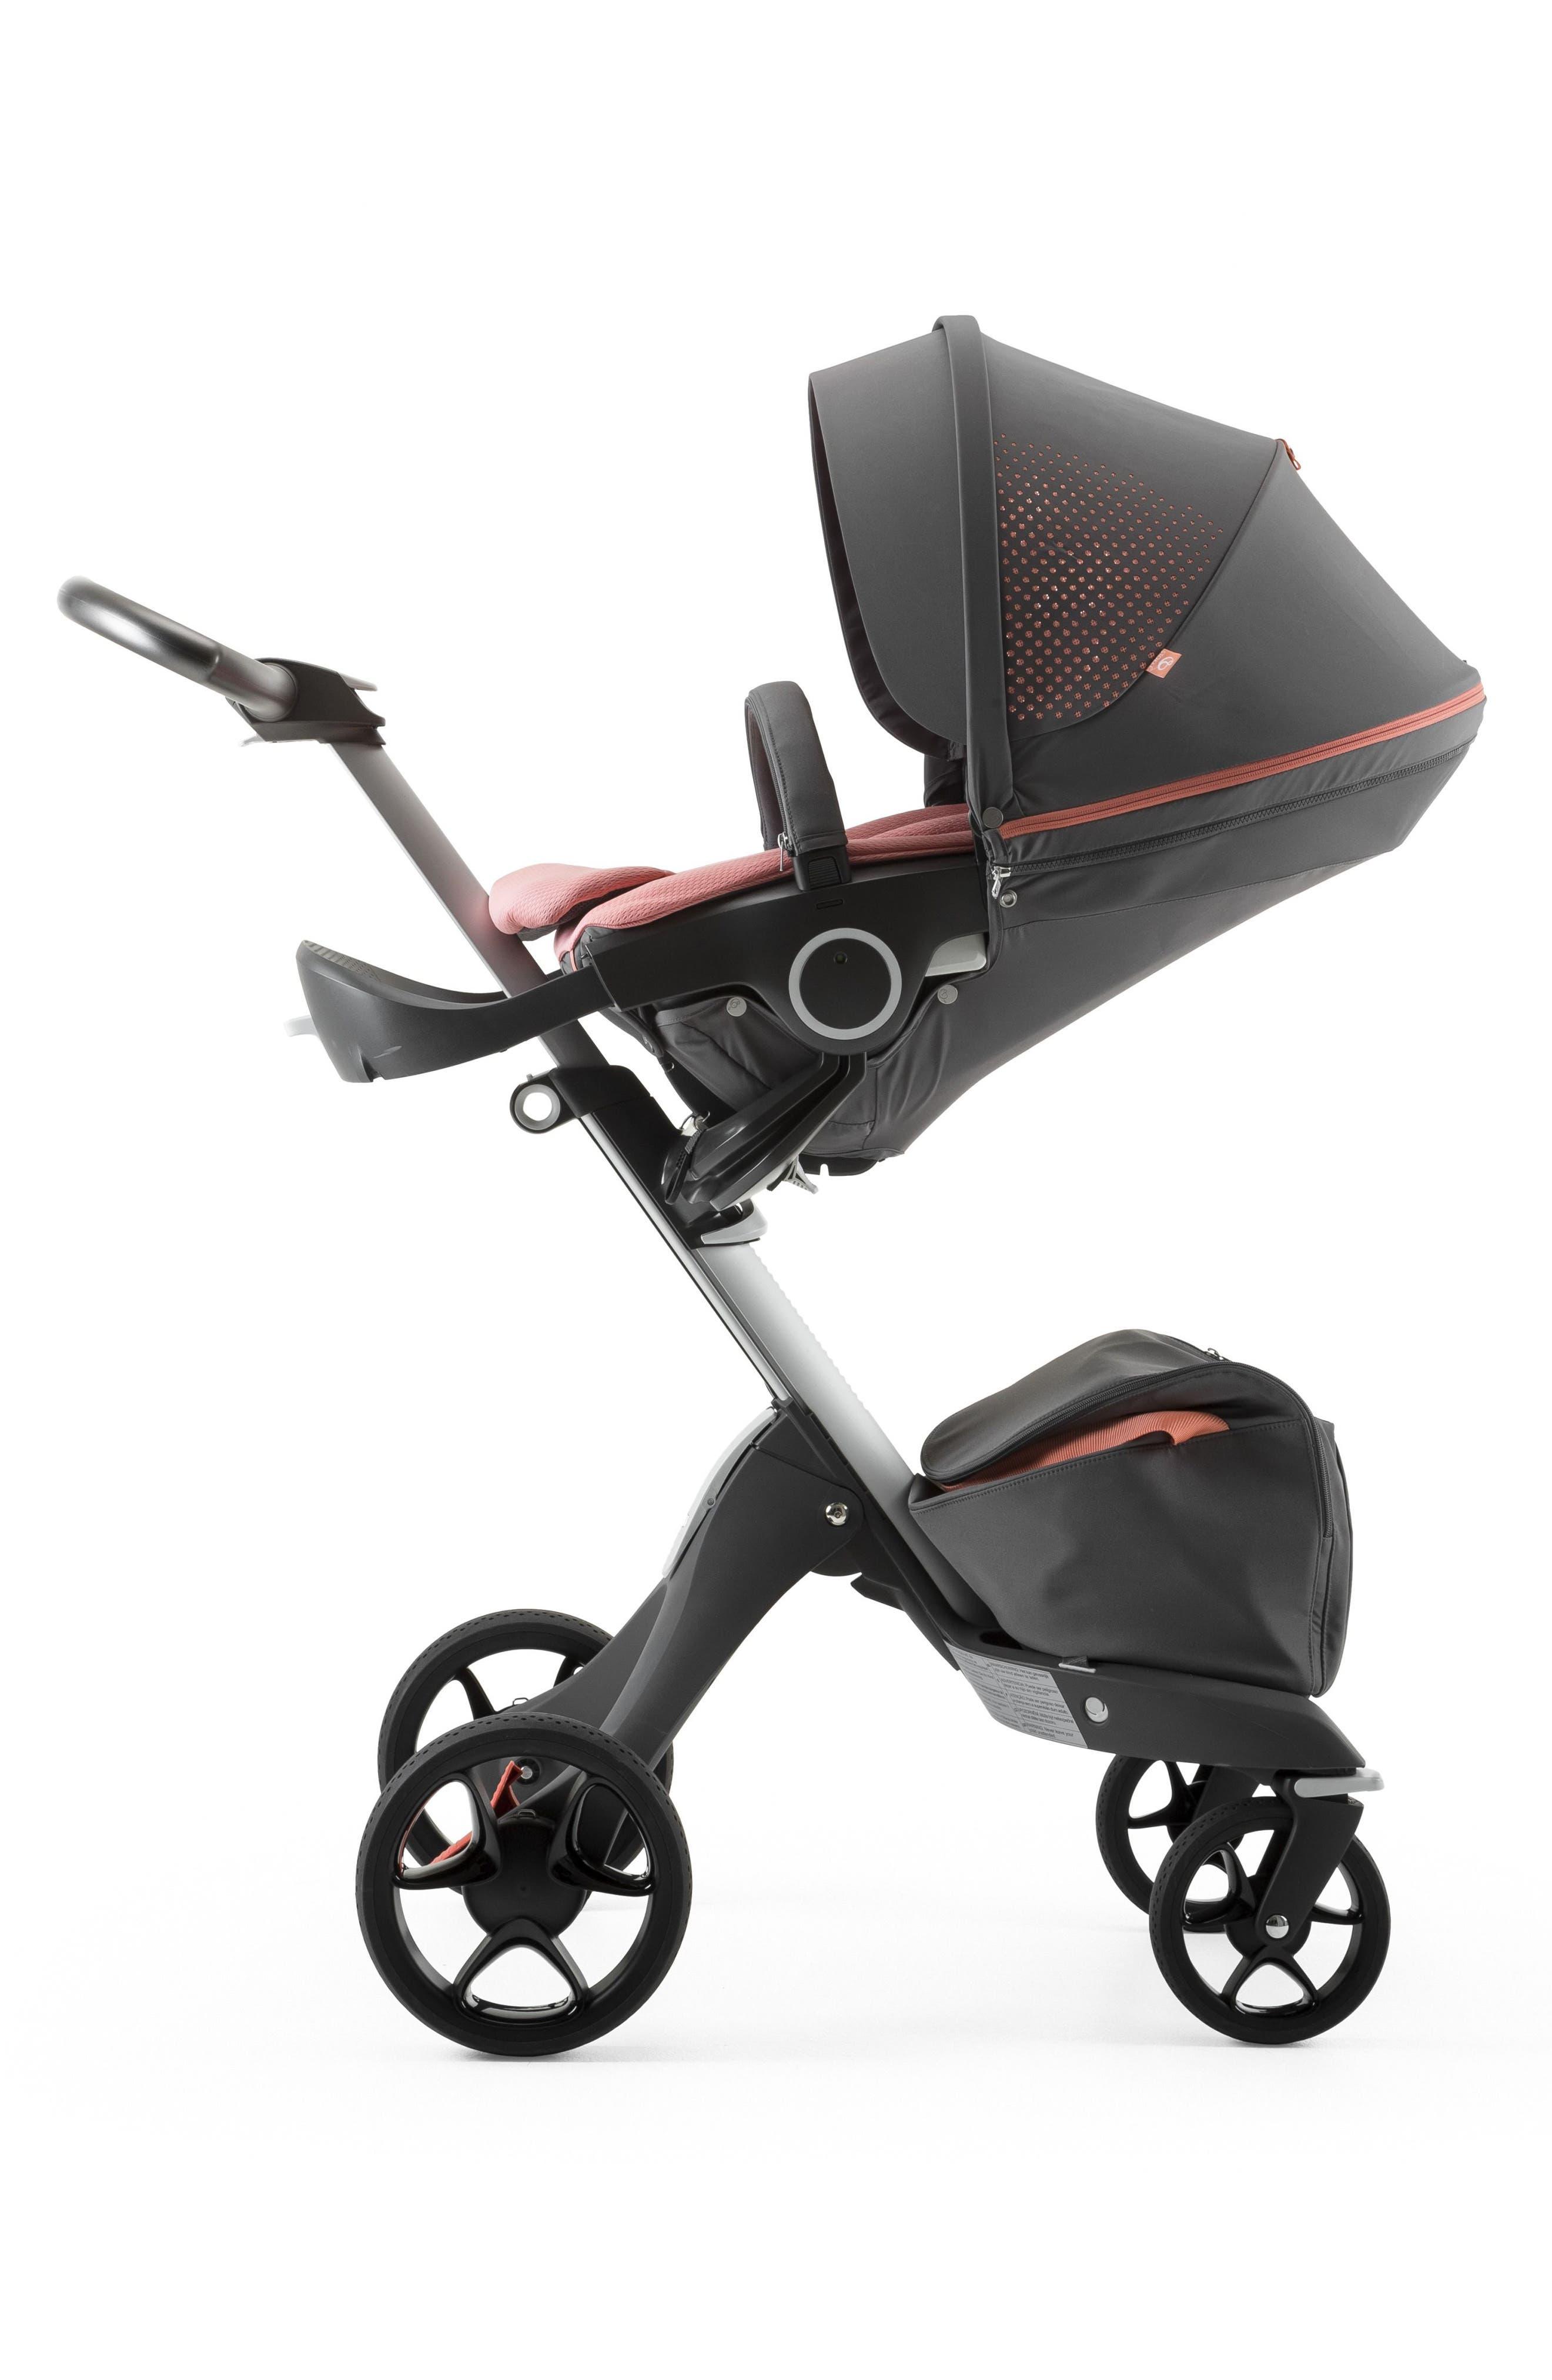 Main Image - Stokke Xplory® V5 Coral Athleisure Stroller